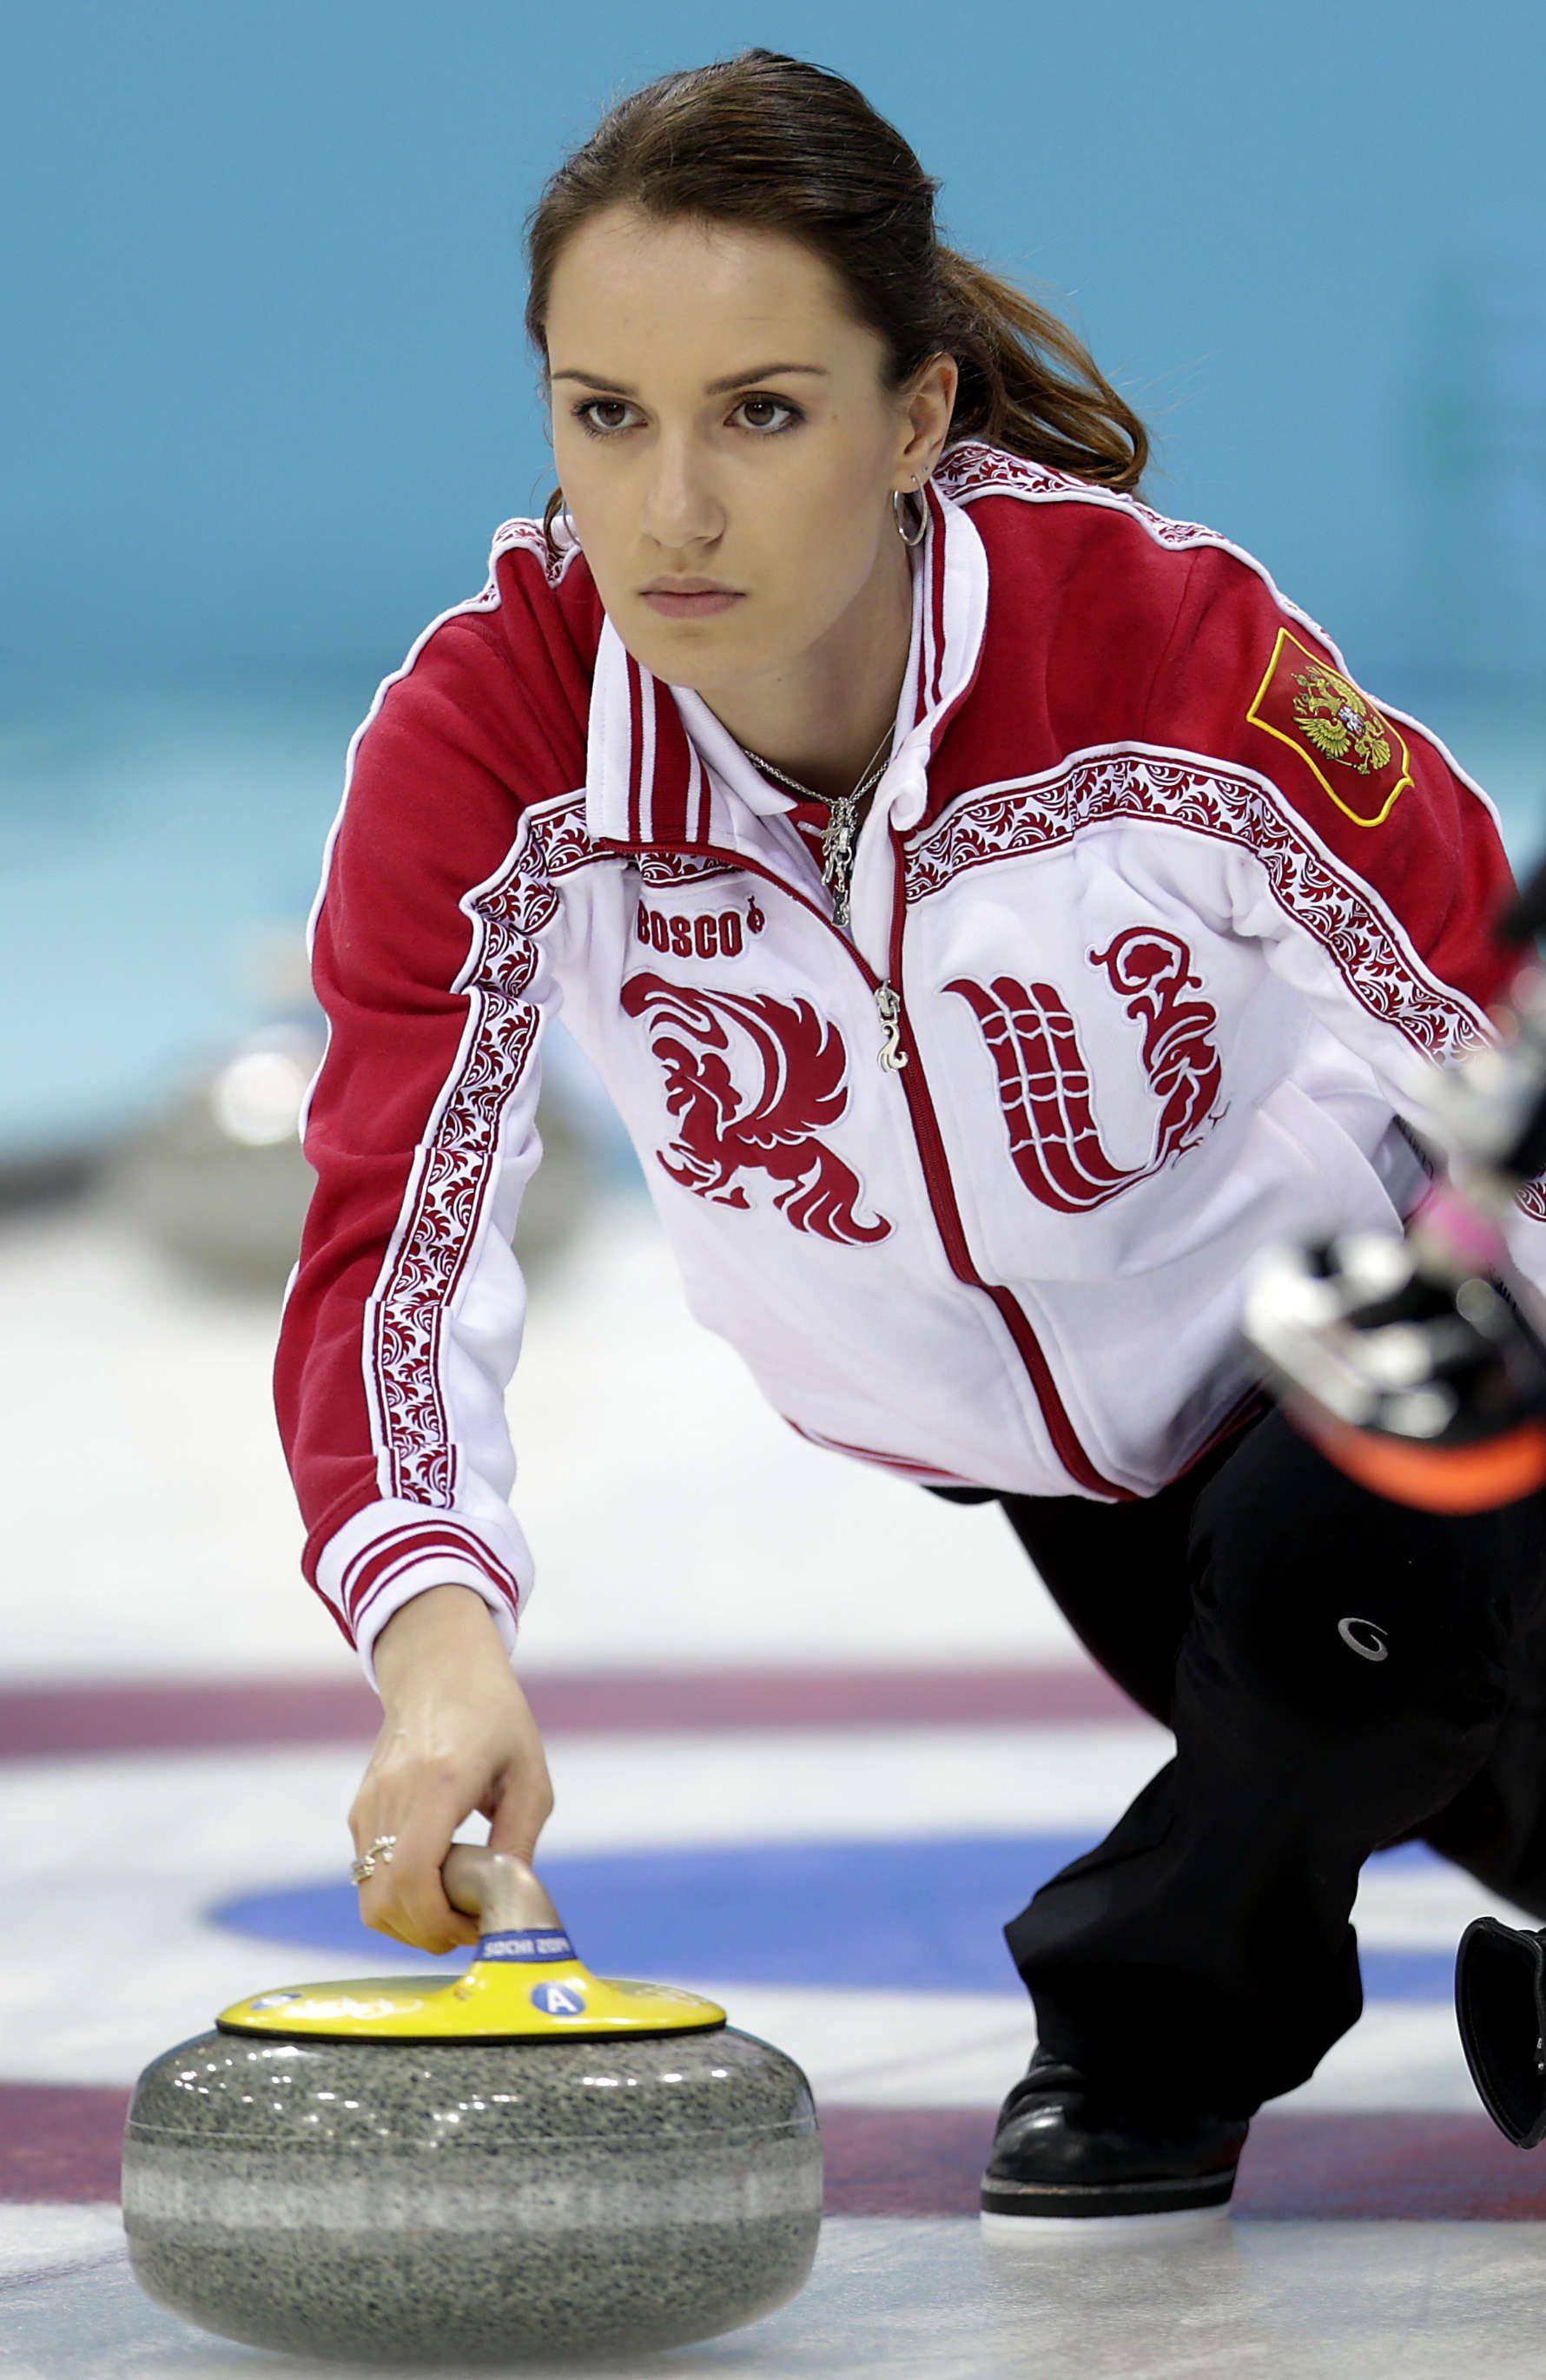 Anna Sidorova | Sexy sport | Pinterest | Anna